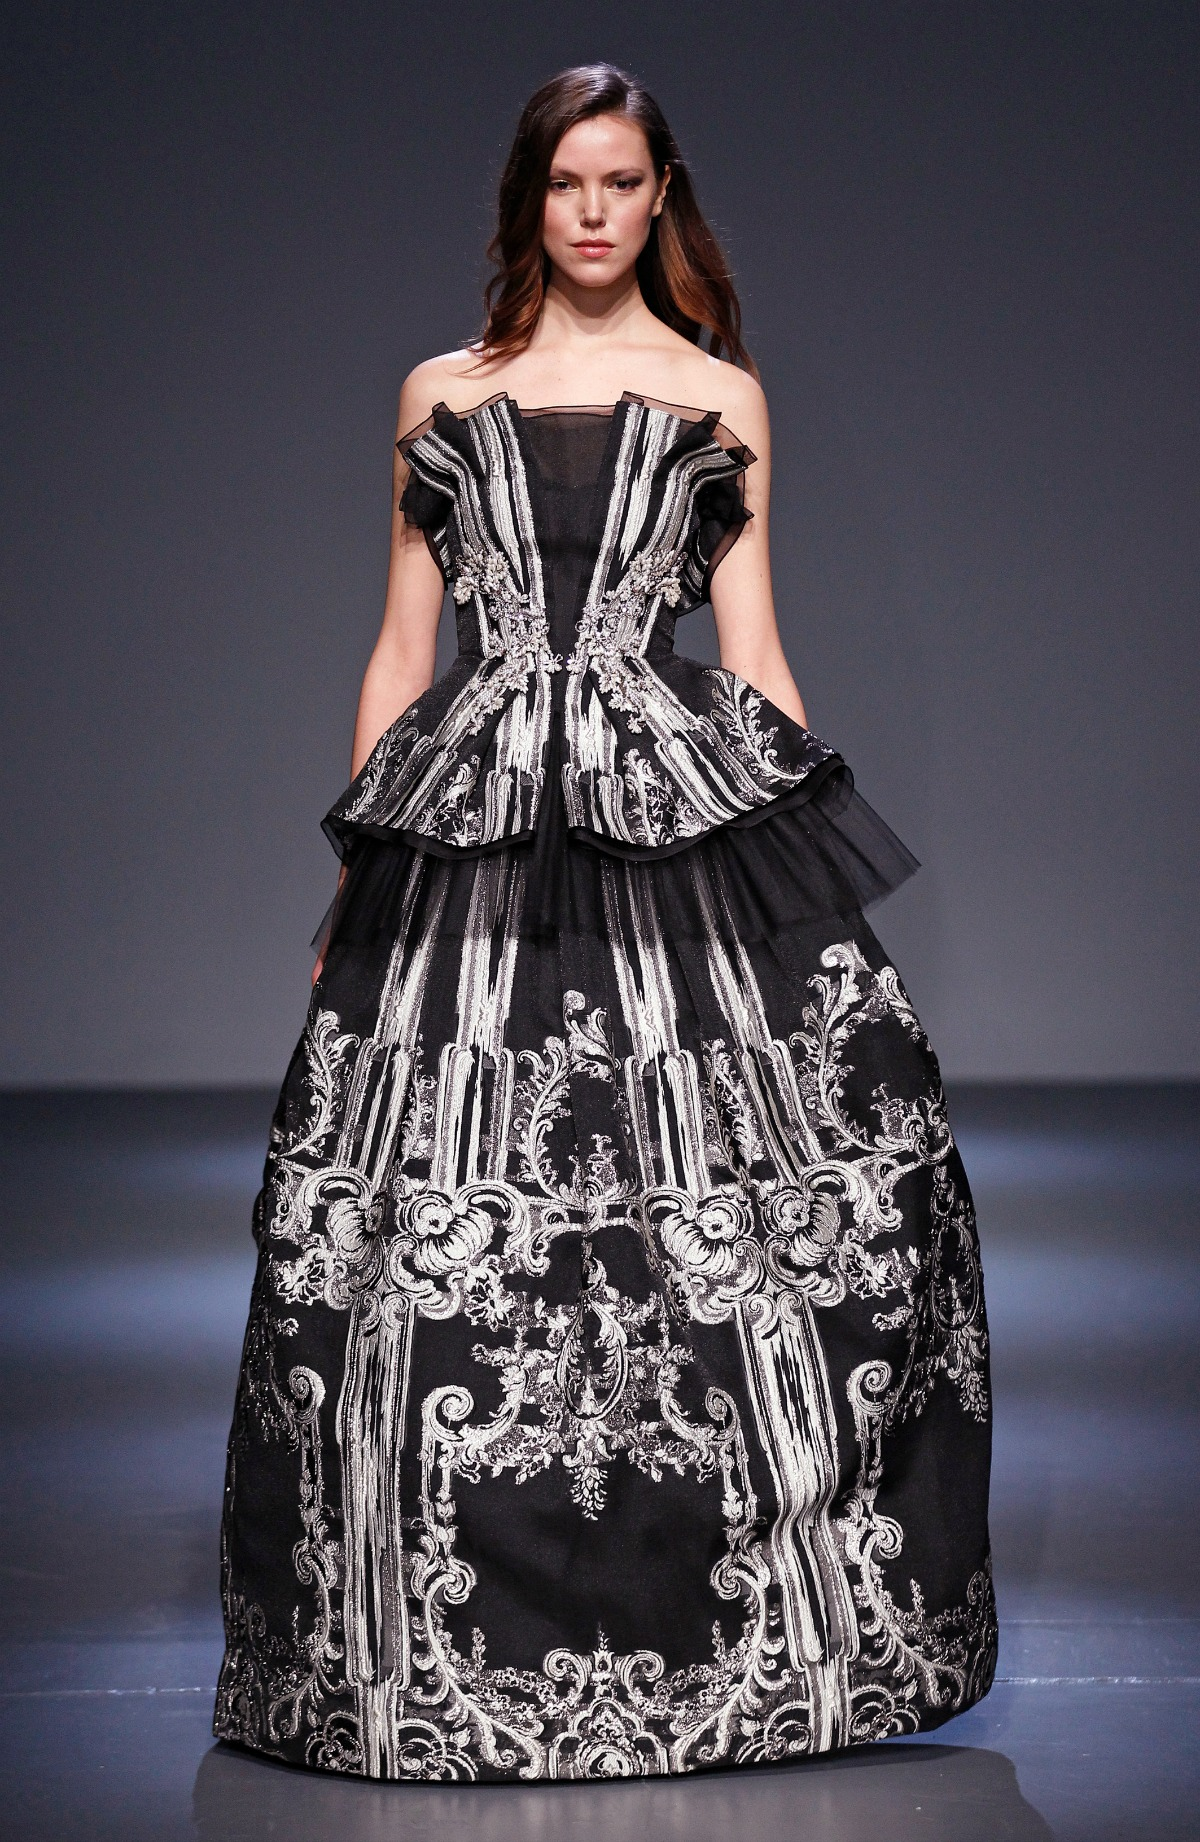 Pamella Roland Fall 2018 Runway I Black and White Baroque Ballgown #NYFW #DesignerFashion